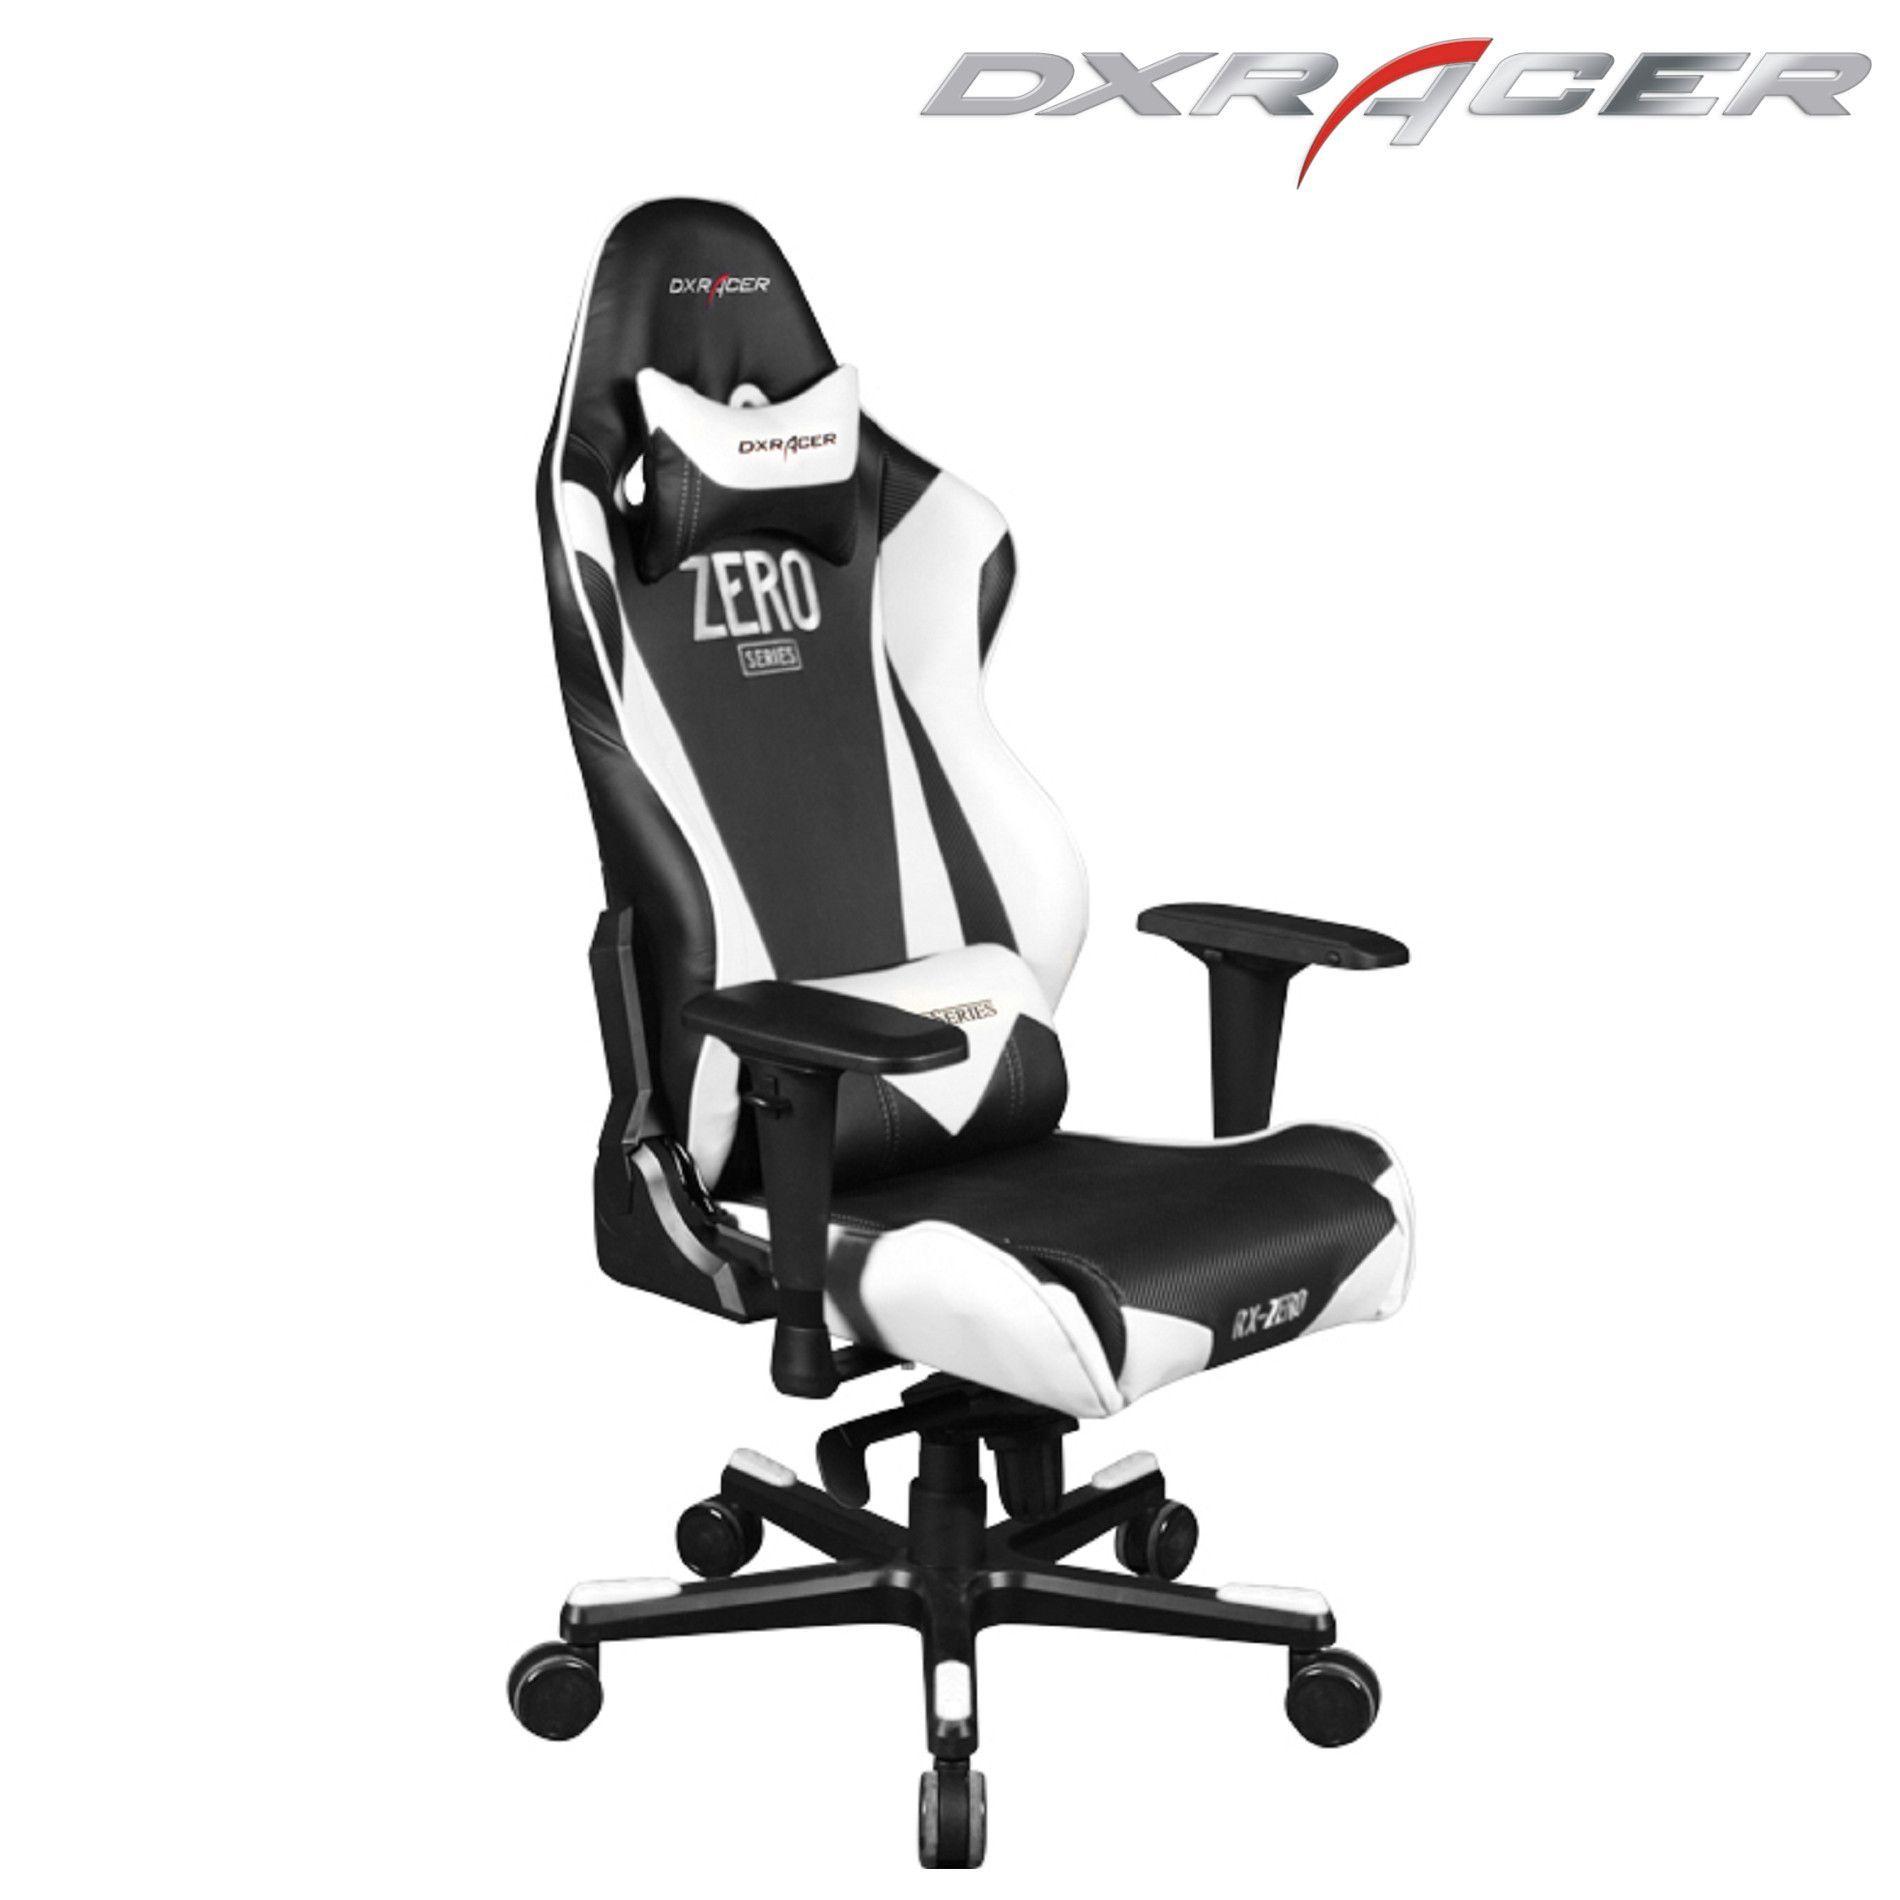 Dxracer rj0iinw computer chair office chair esport chair